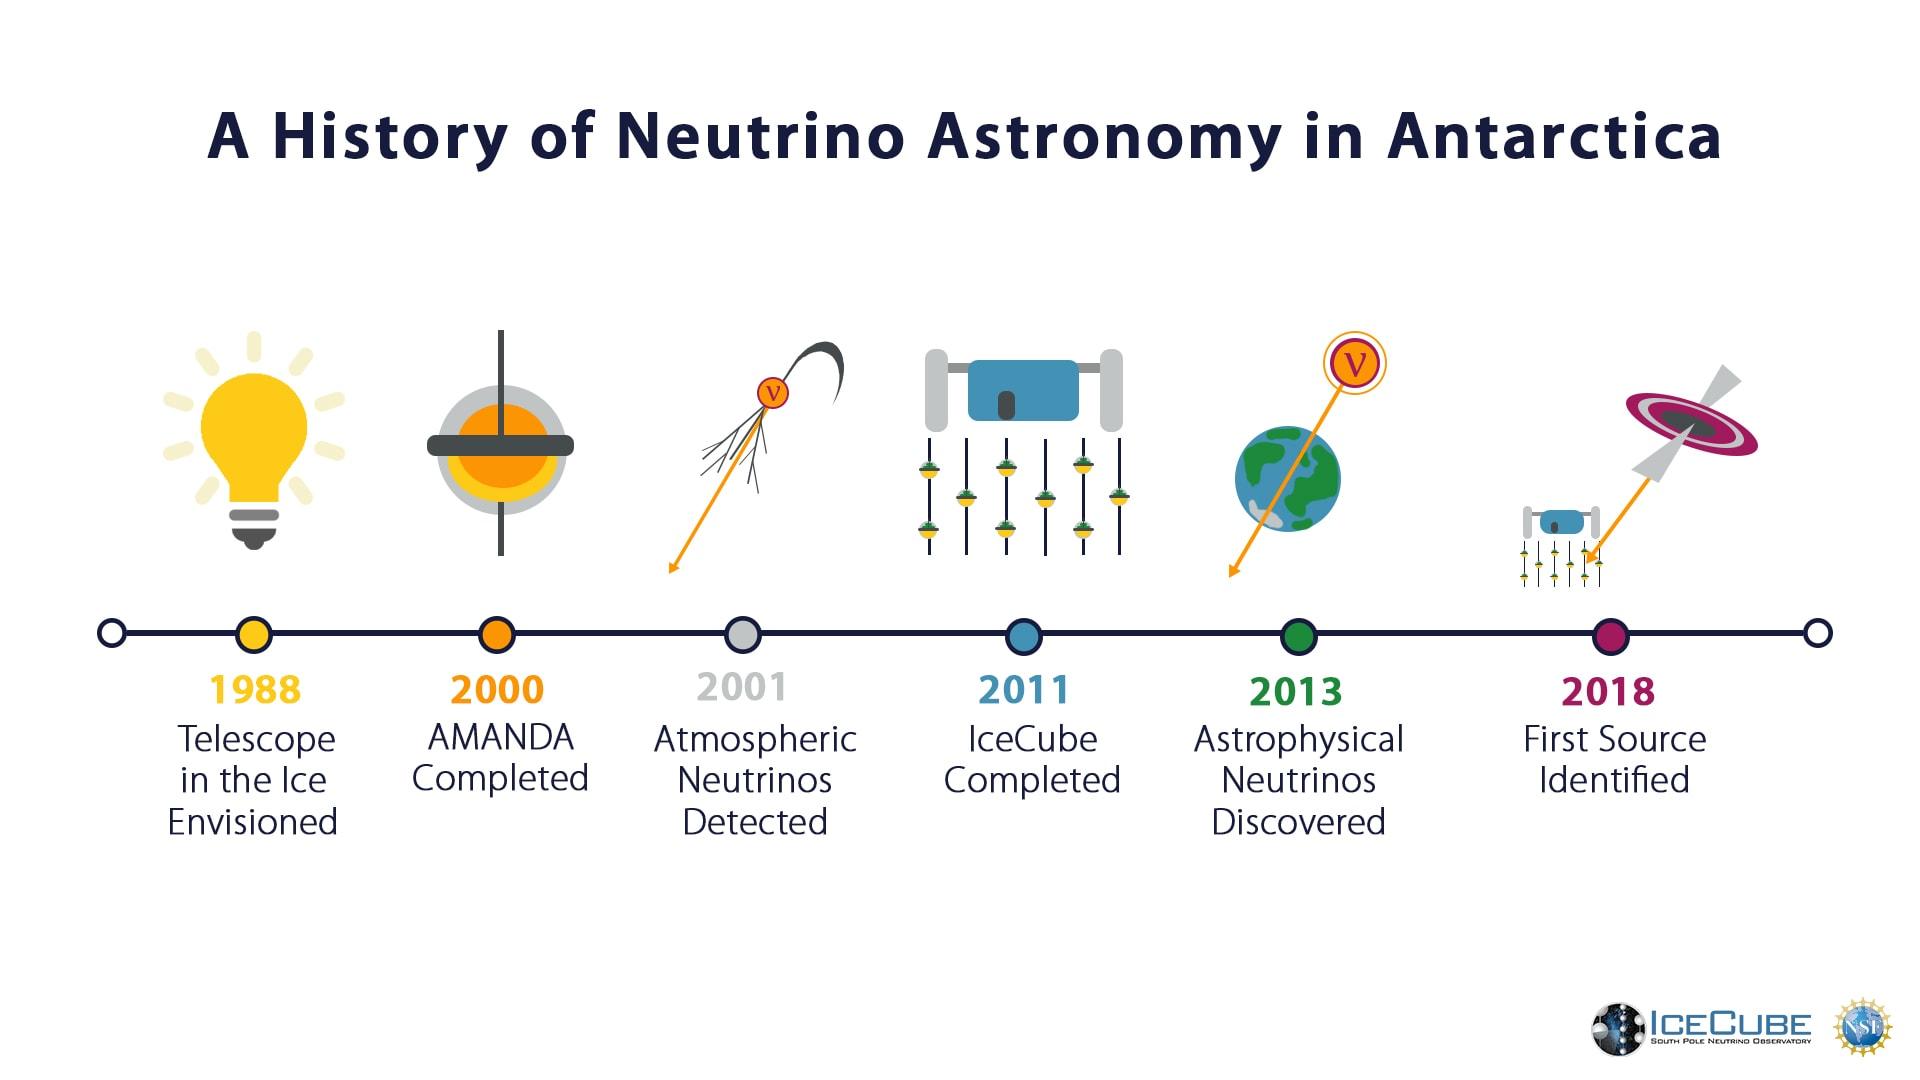 A history of neutrino astronomy in Antarctica